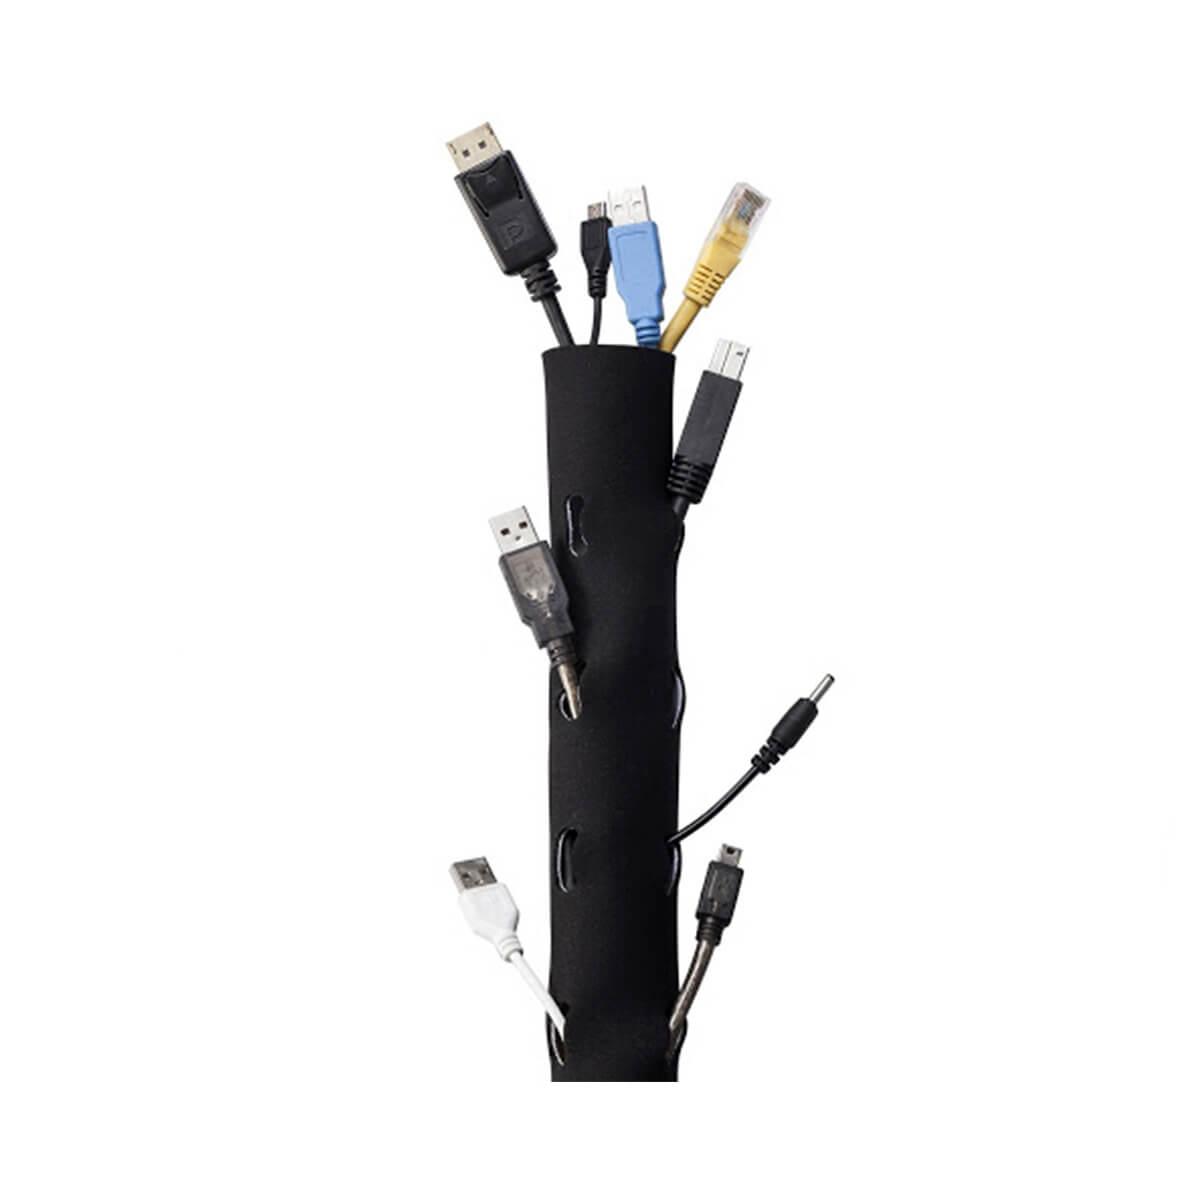 Cable Management System_black